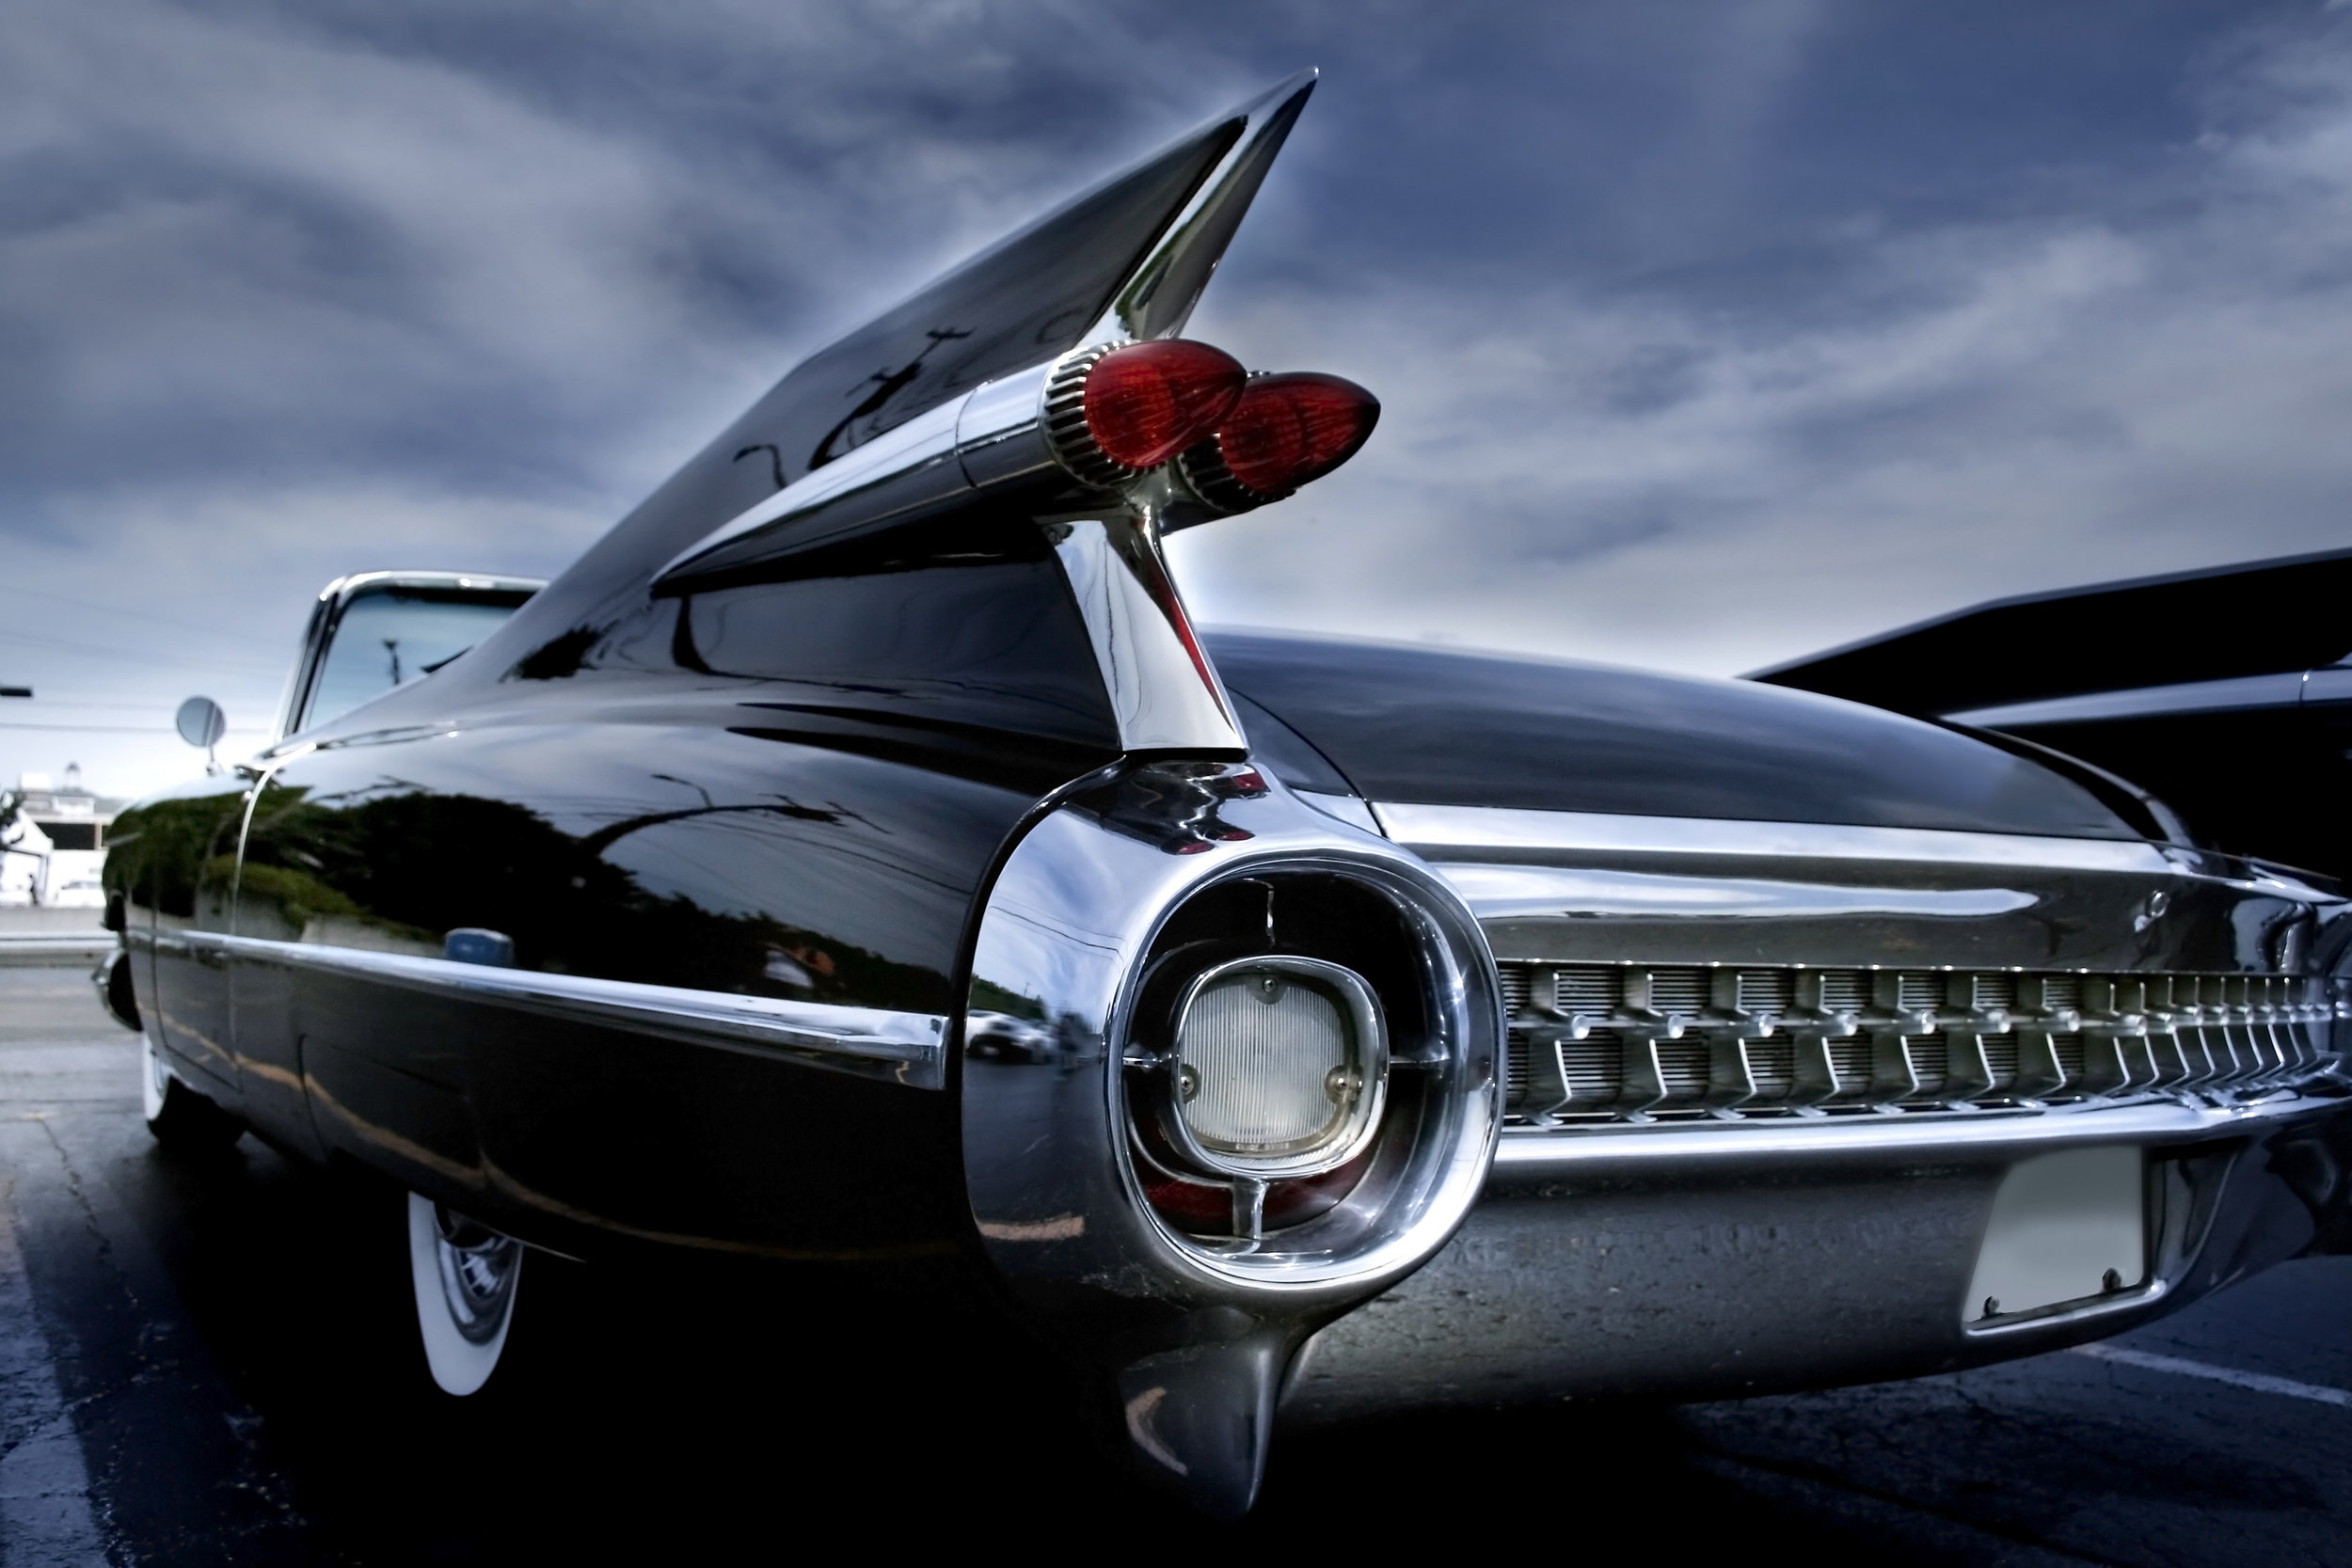 antique auto-resized.jpg